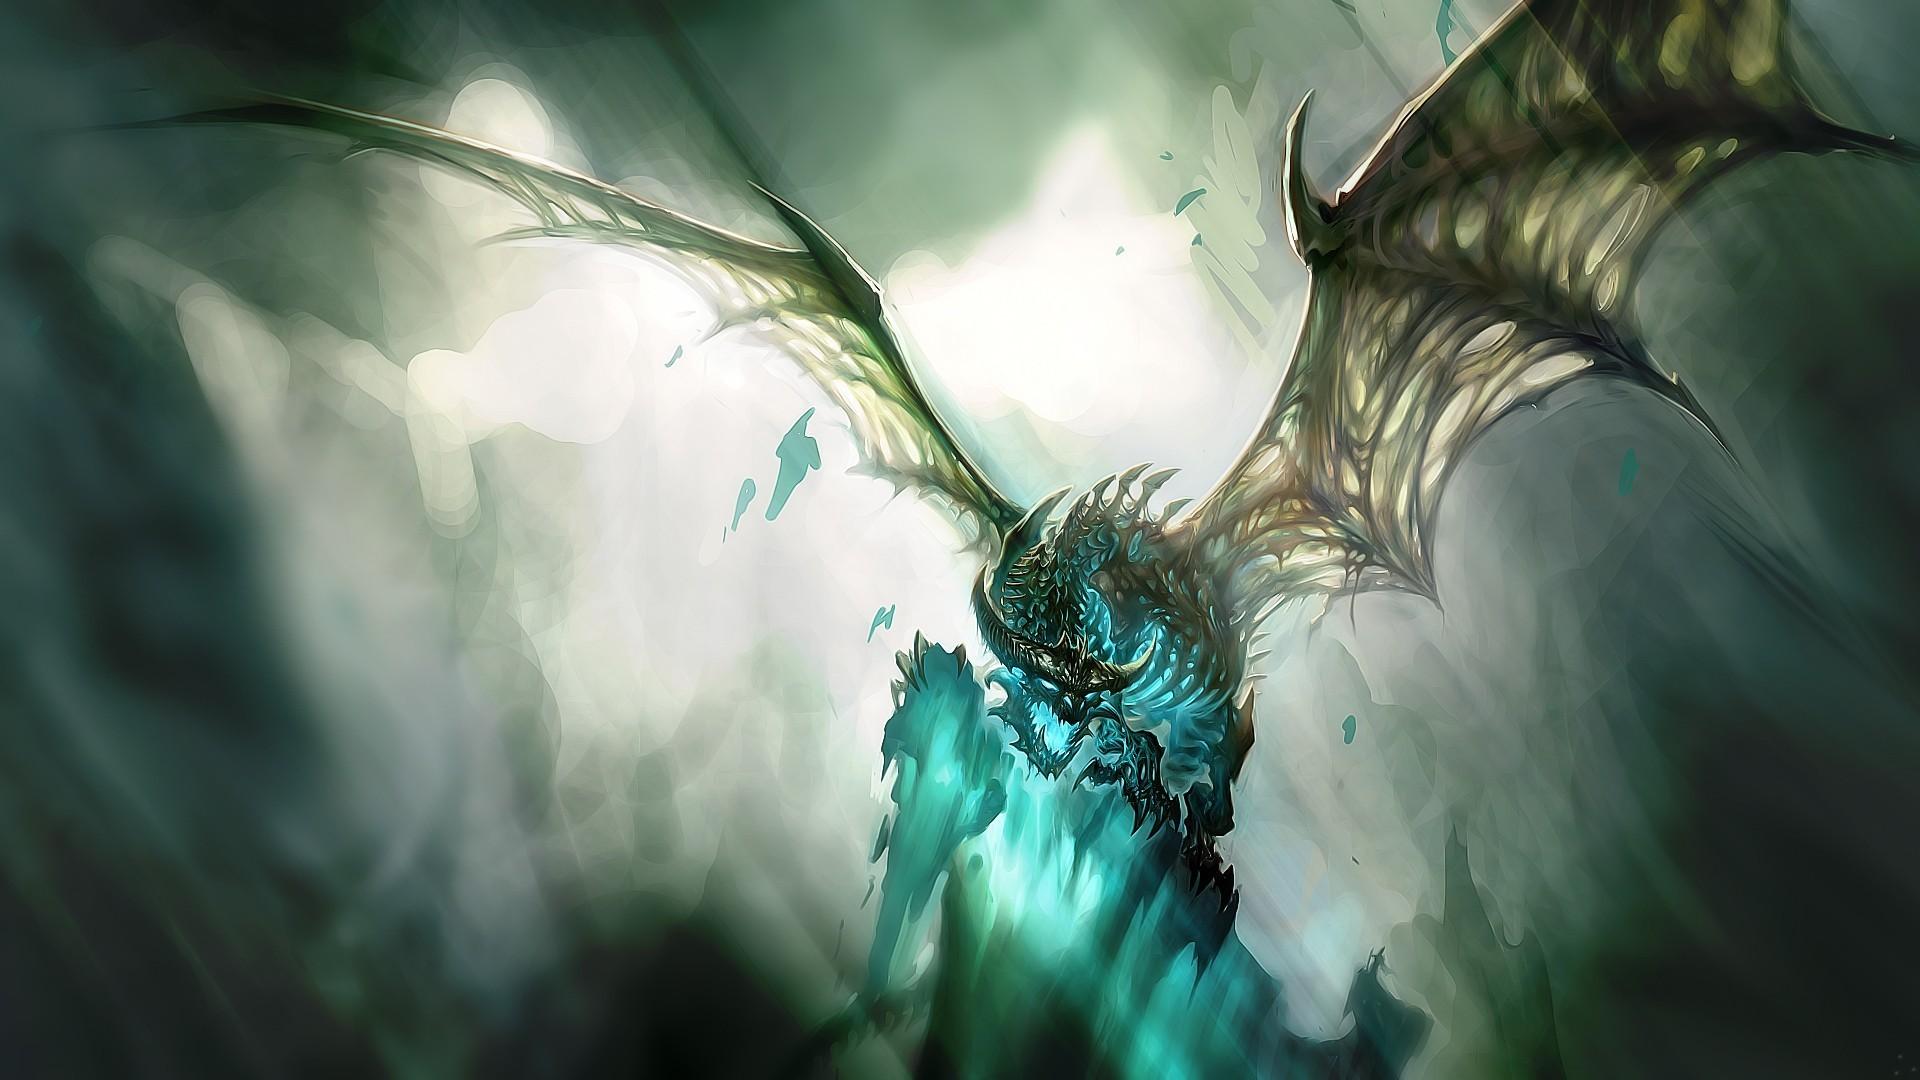 Video Game - World Of Warcraft  Dragon Fantasy Wallpaper